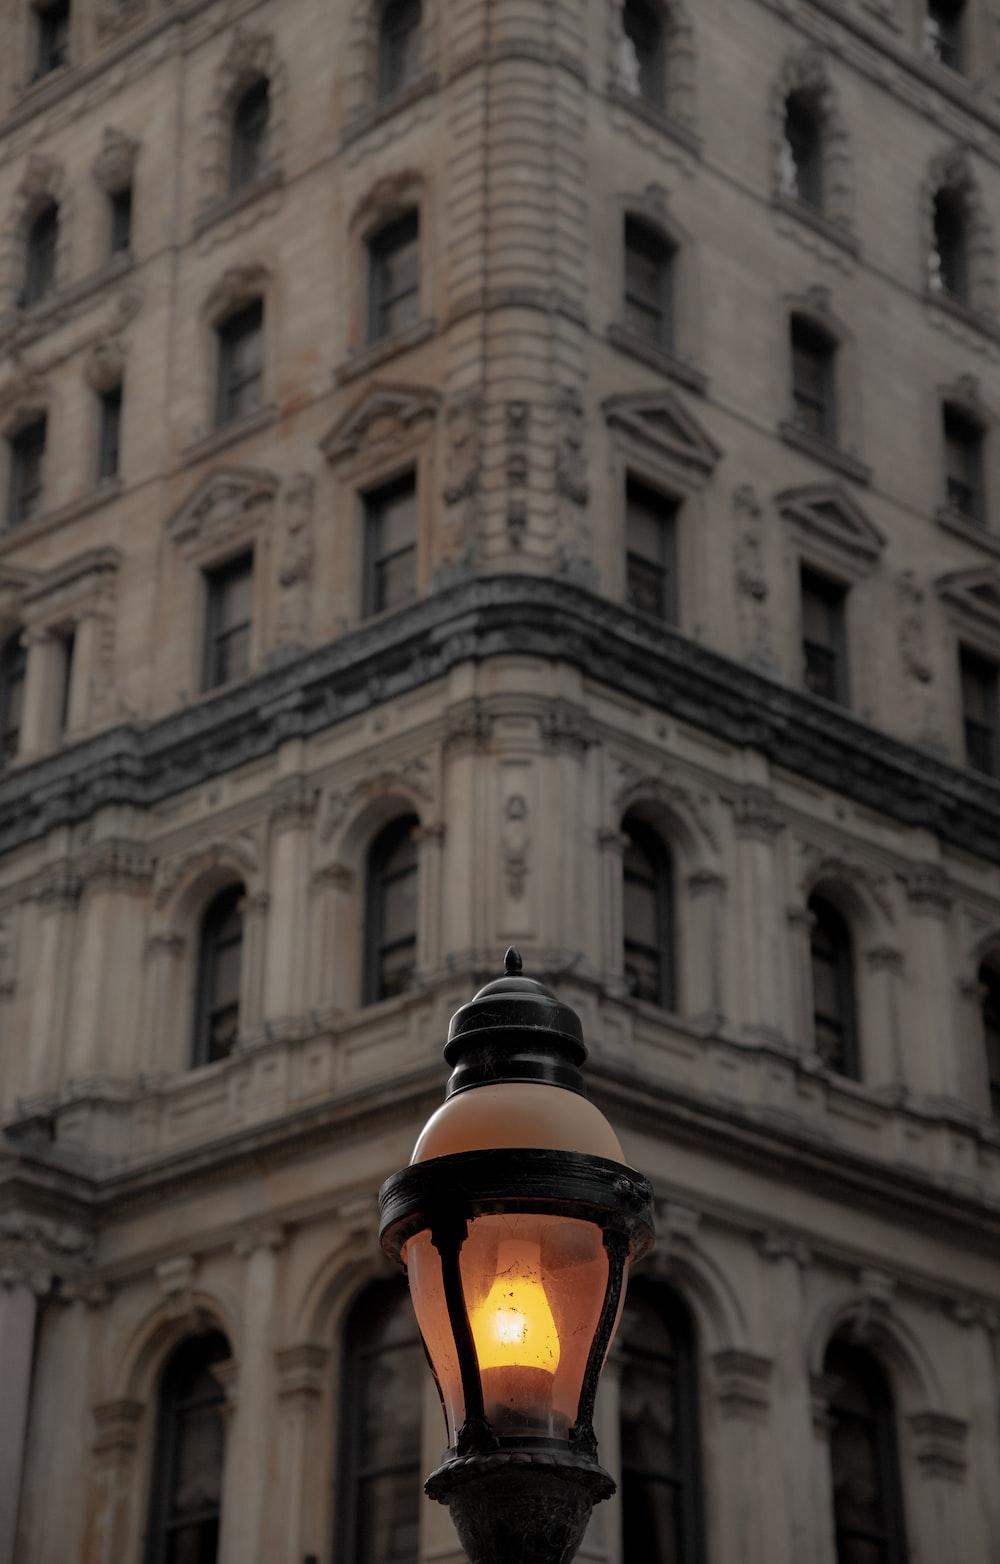 street lamp near white concrete building during daytime